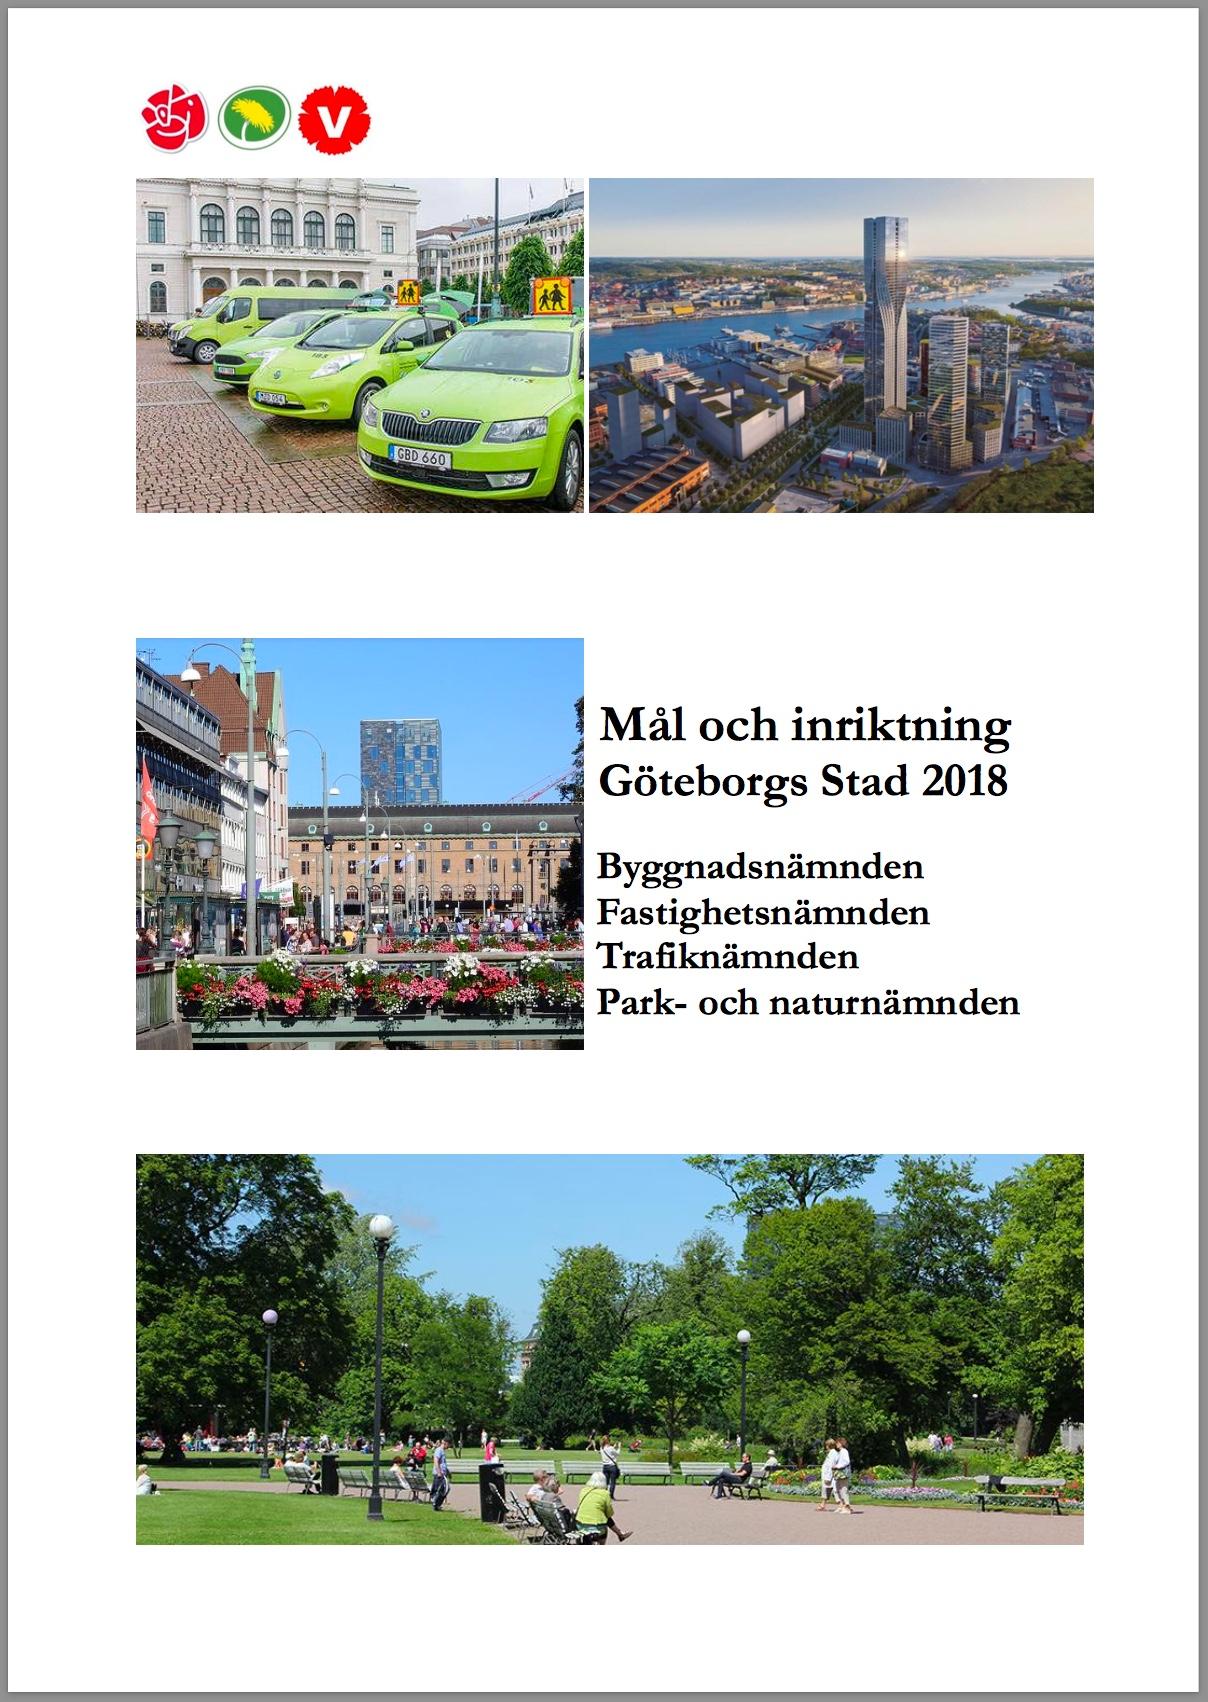 göteborgs stad server inloggning